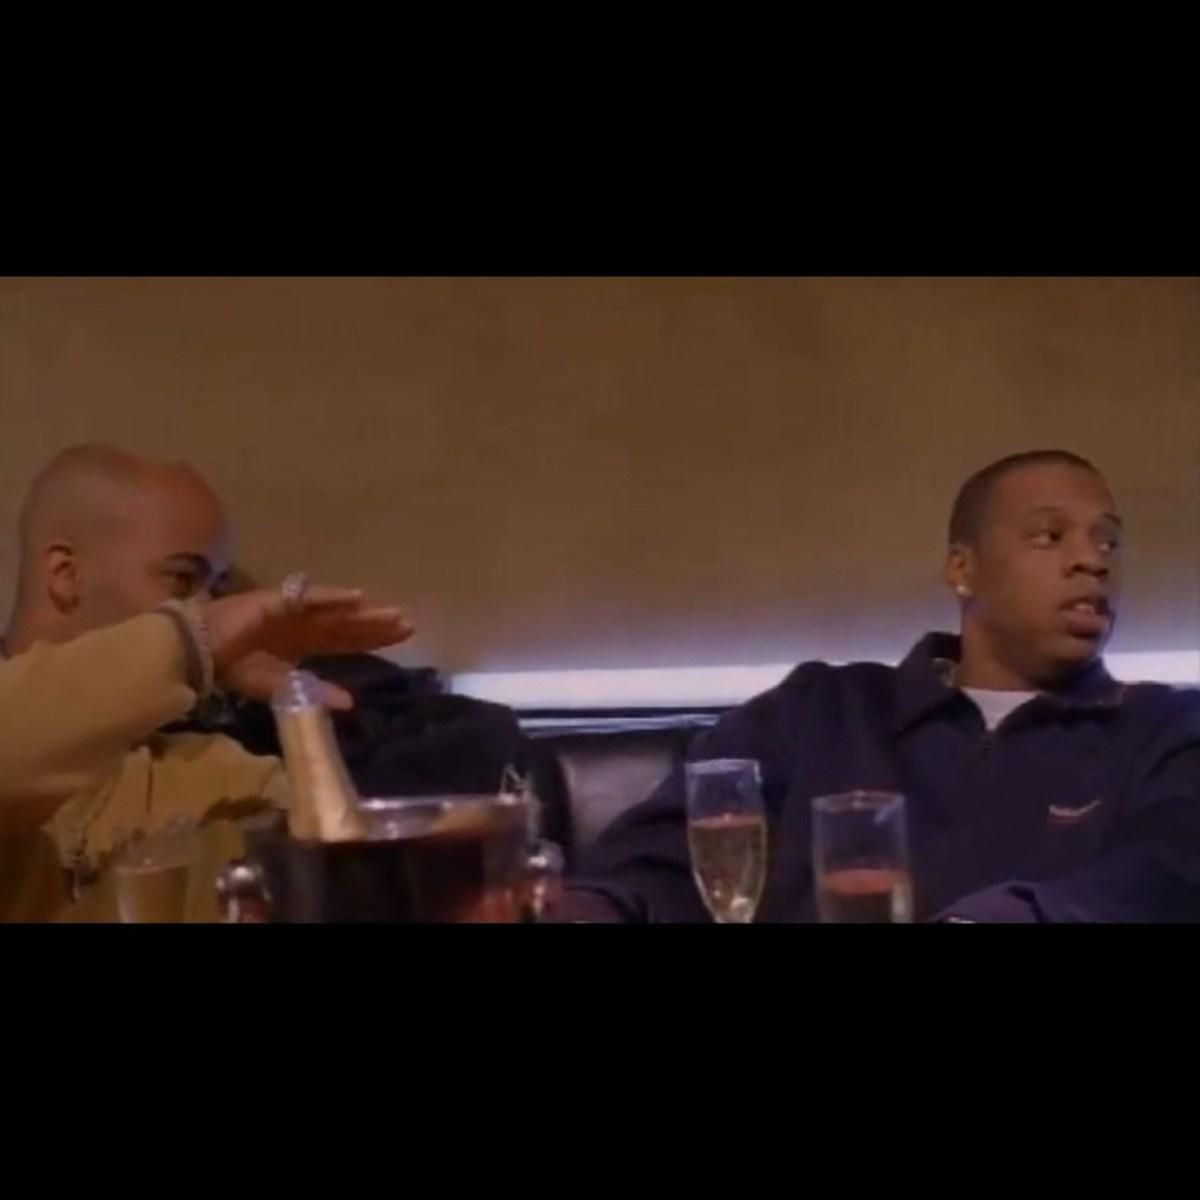 Jay-Z - Imaginary Player (Thumbnail)